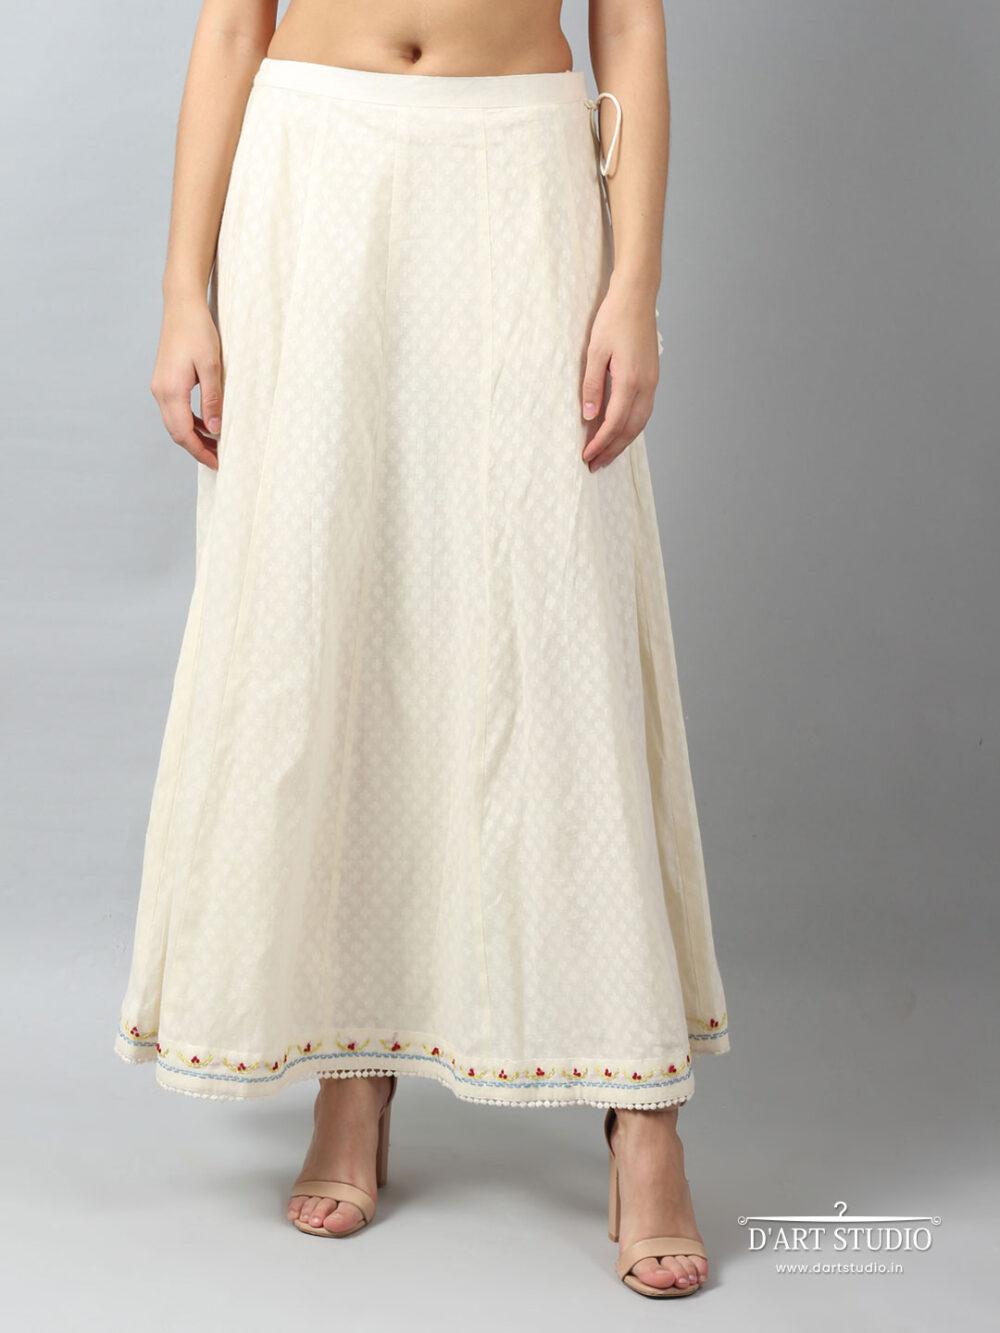 Hand Embroidered Cotton Skirt DARTSTUDIO6008